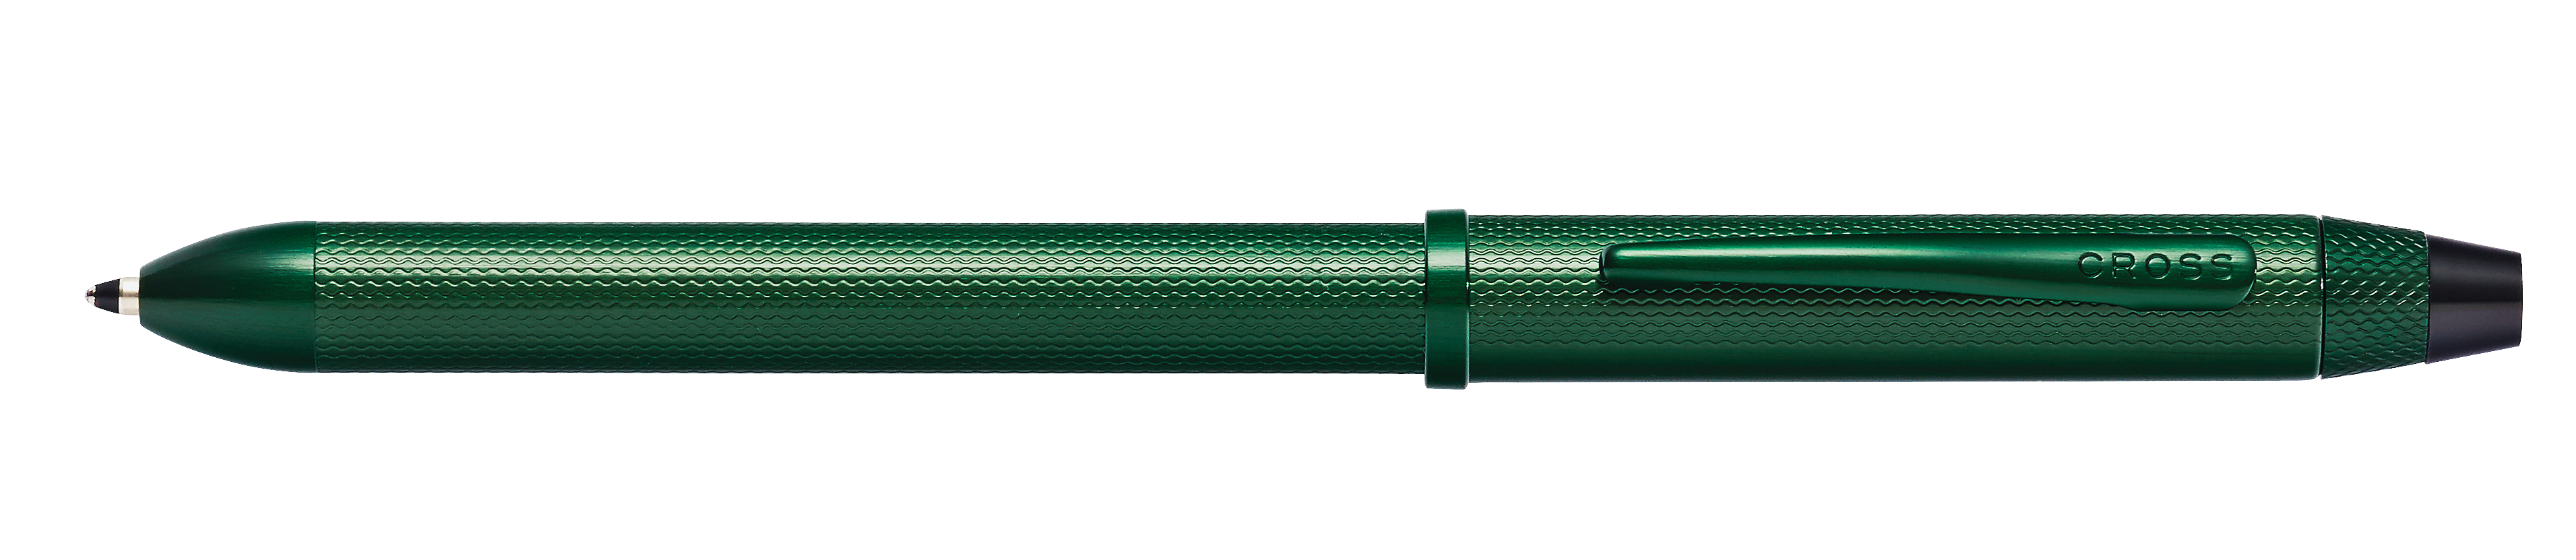 Tech3+ Matte Green PVD Multifunction Pen